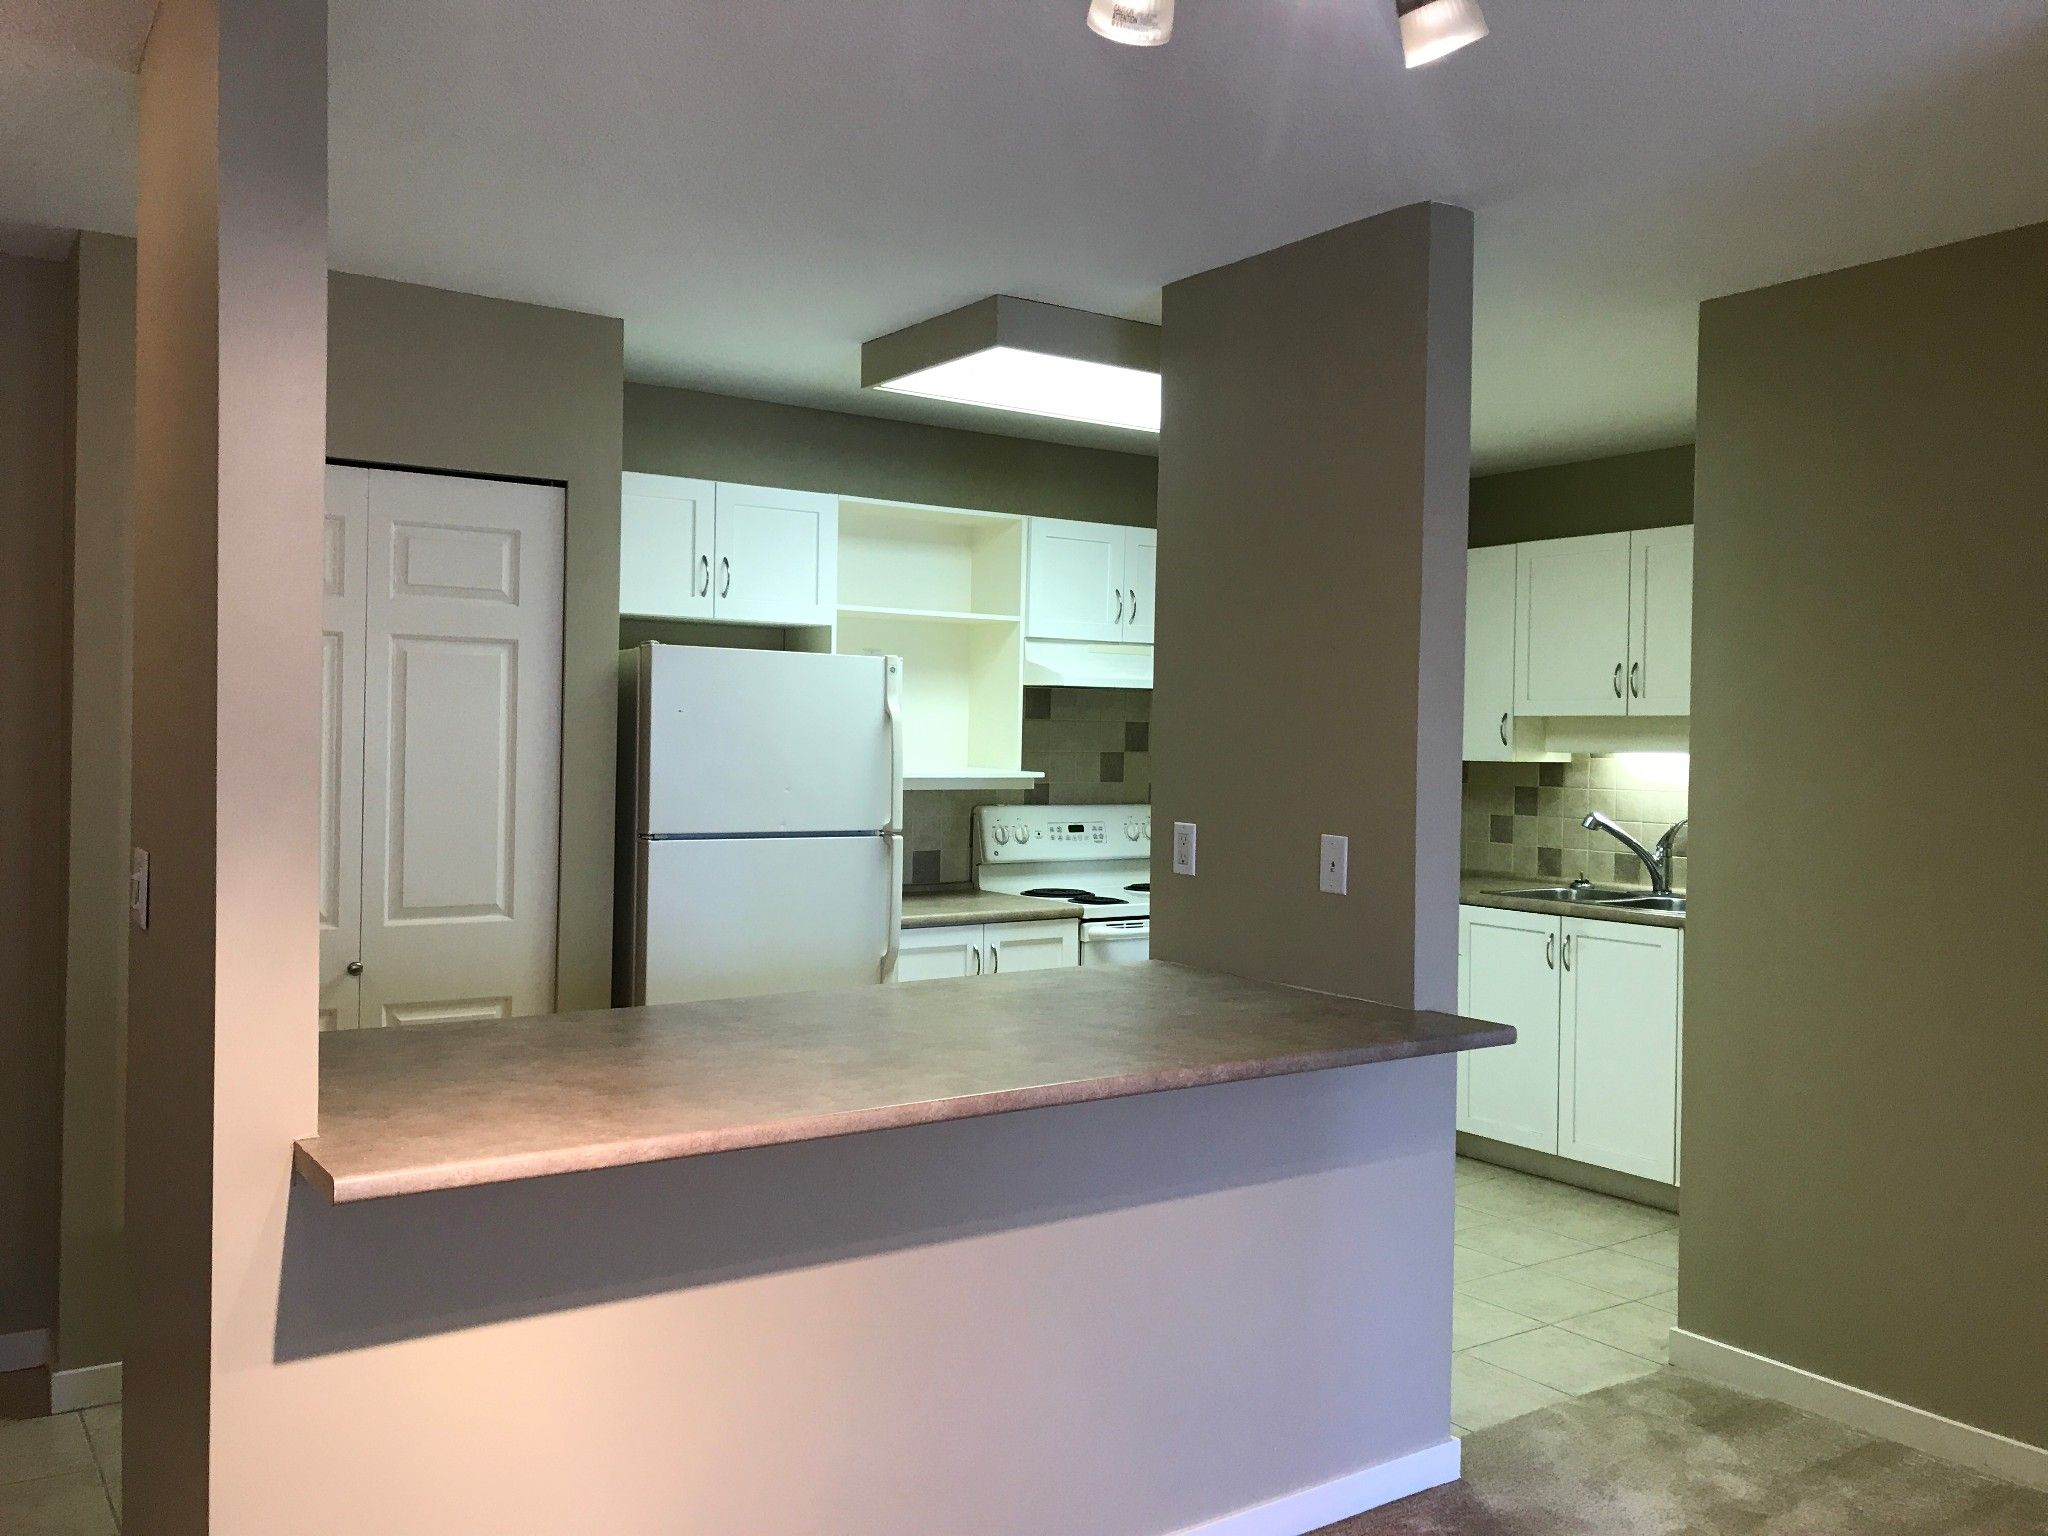 Photo 5: Photos: #329 2700 McCallum Rd. in Abbotsford: Central Abbotsford Condo for rent